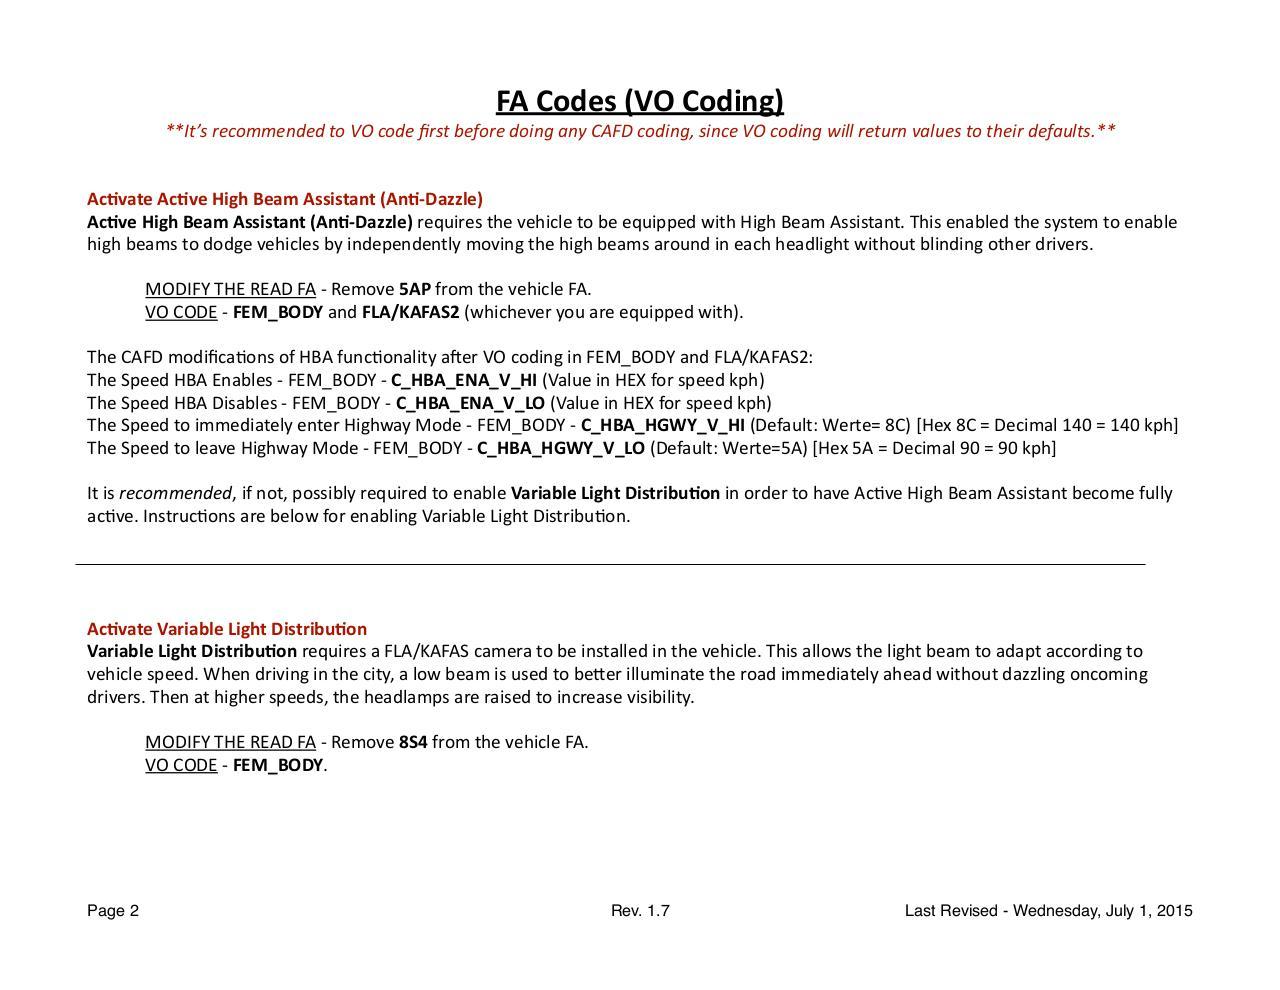 BMW Codes - F30_Coding_Reference_Guide_v1 7 pdf - Fichier PDF